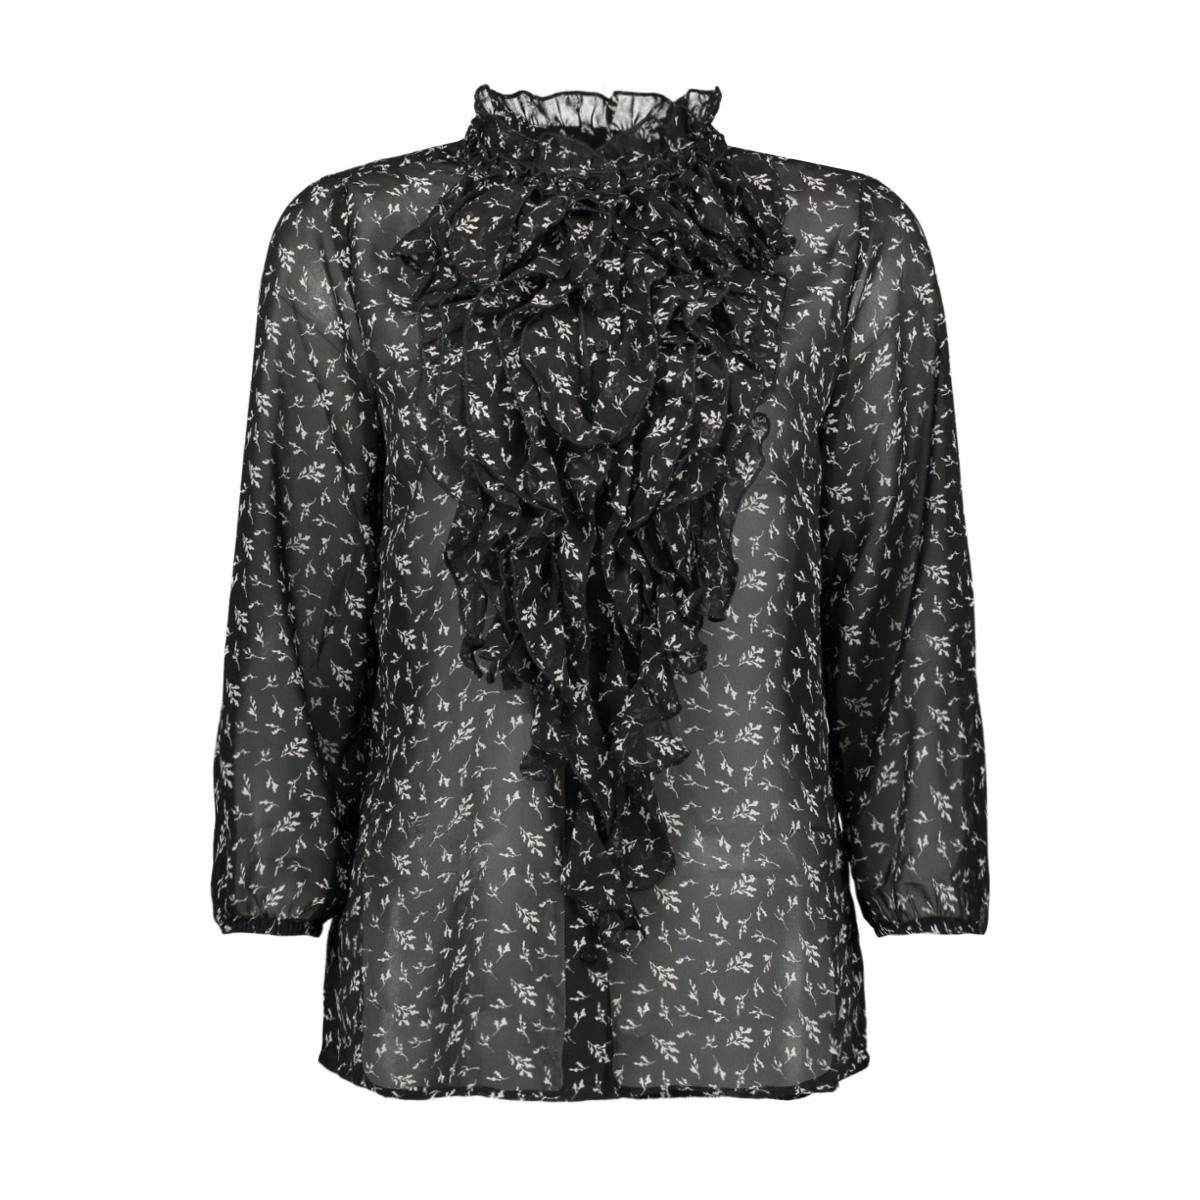 woven top 3/4 sl u1144 saint tropez blouse 0001